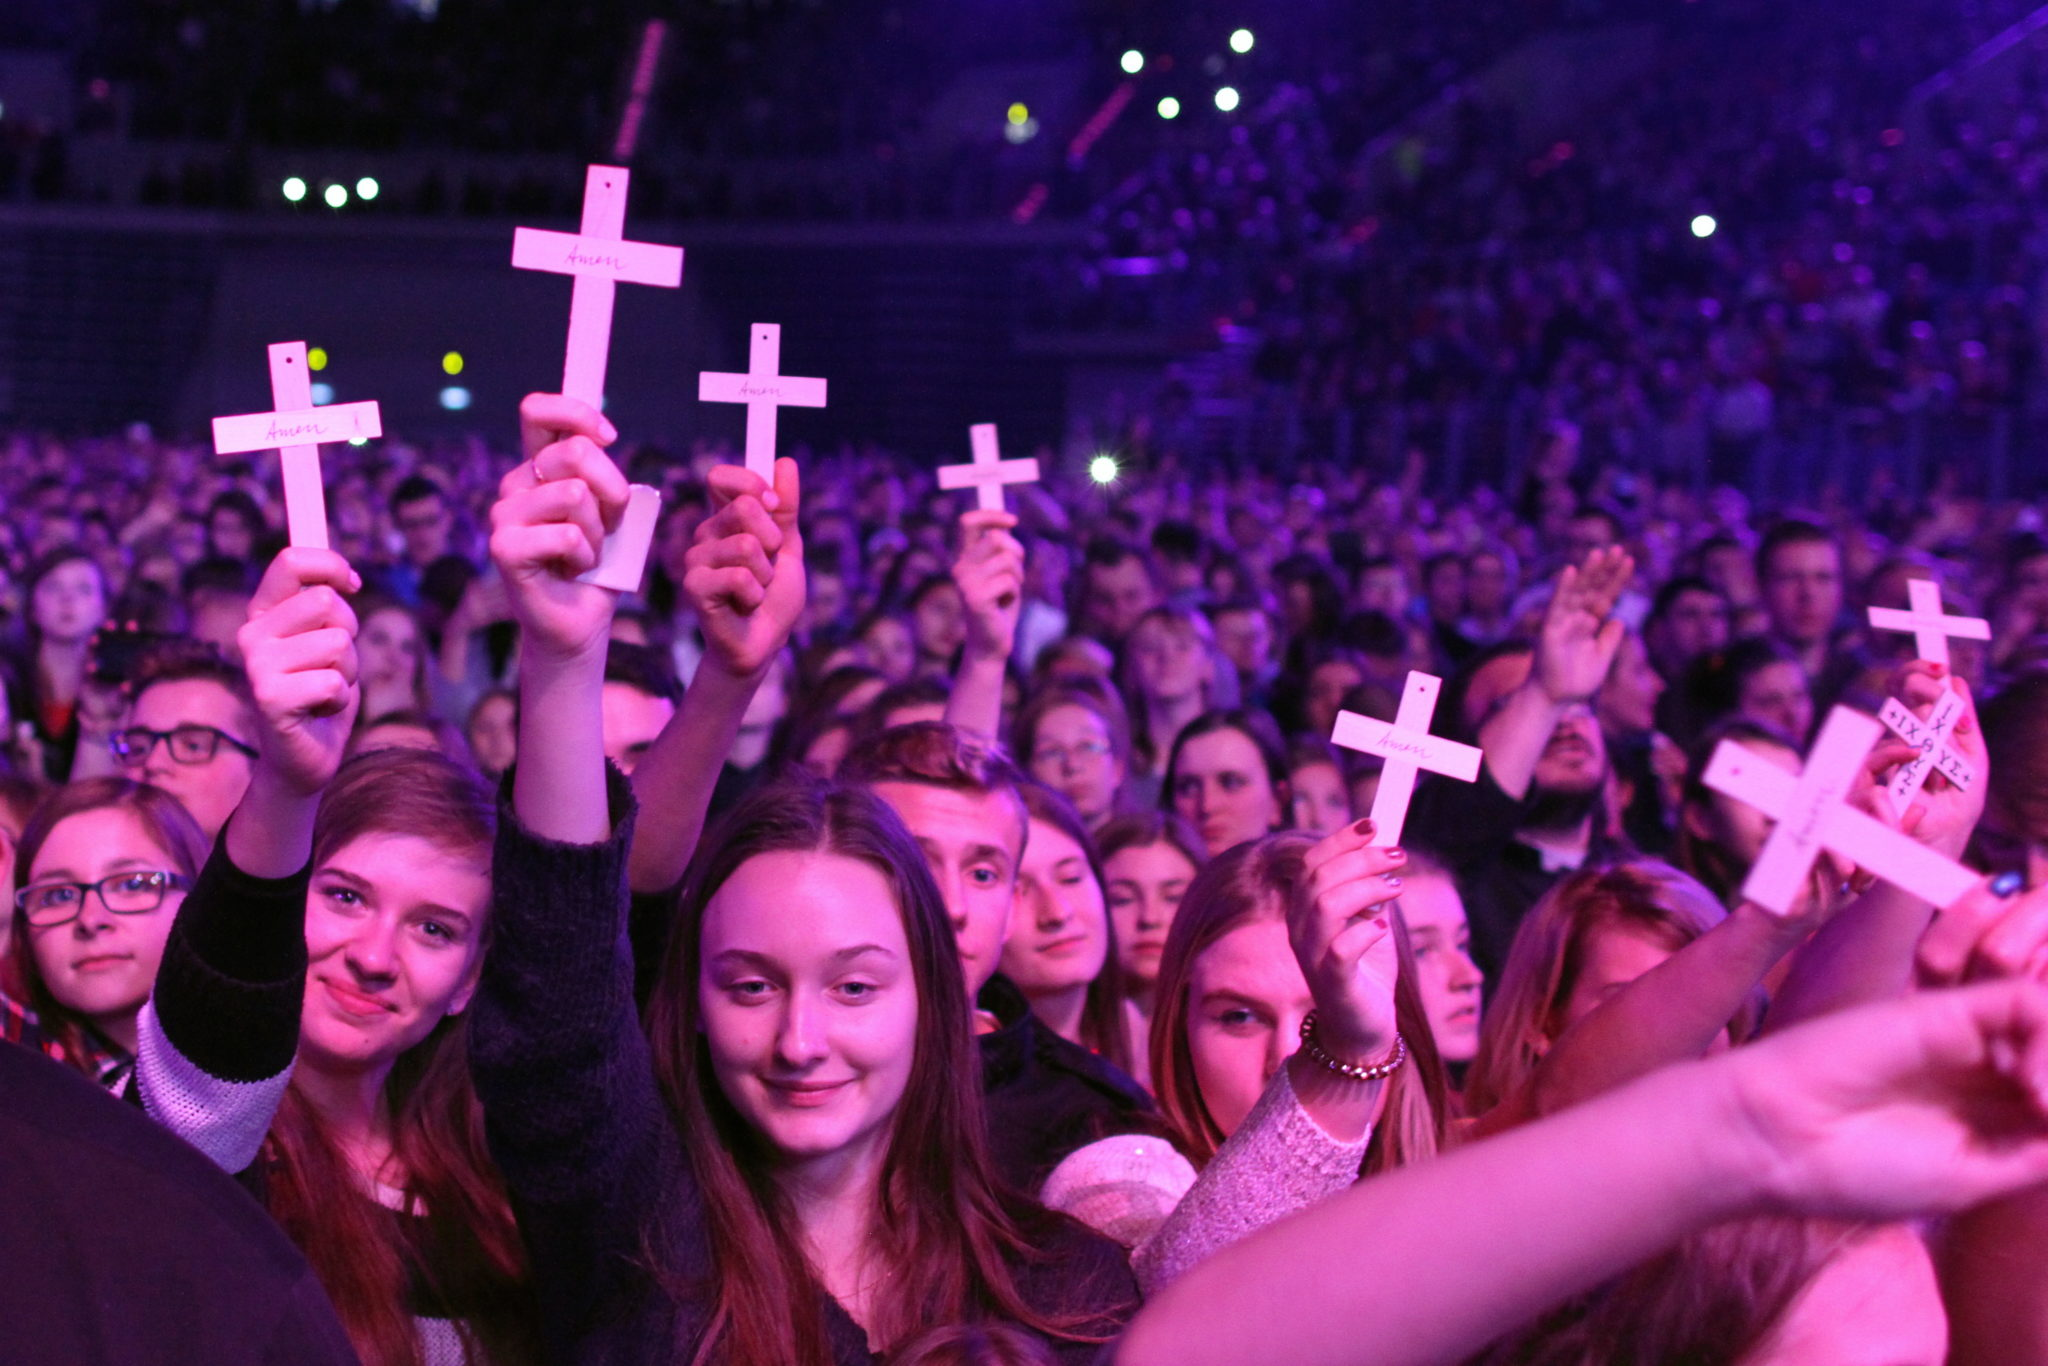 Publicznoœść podczas koncertu